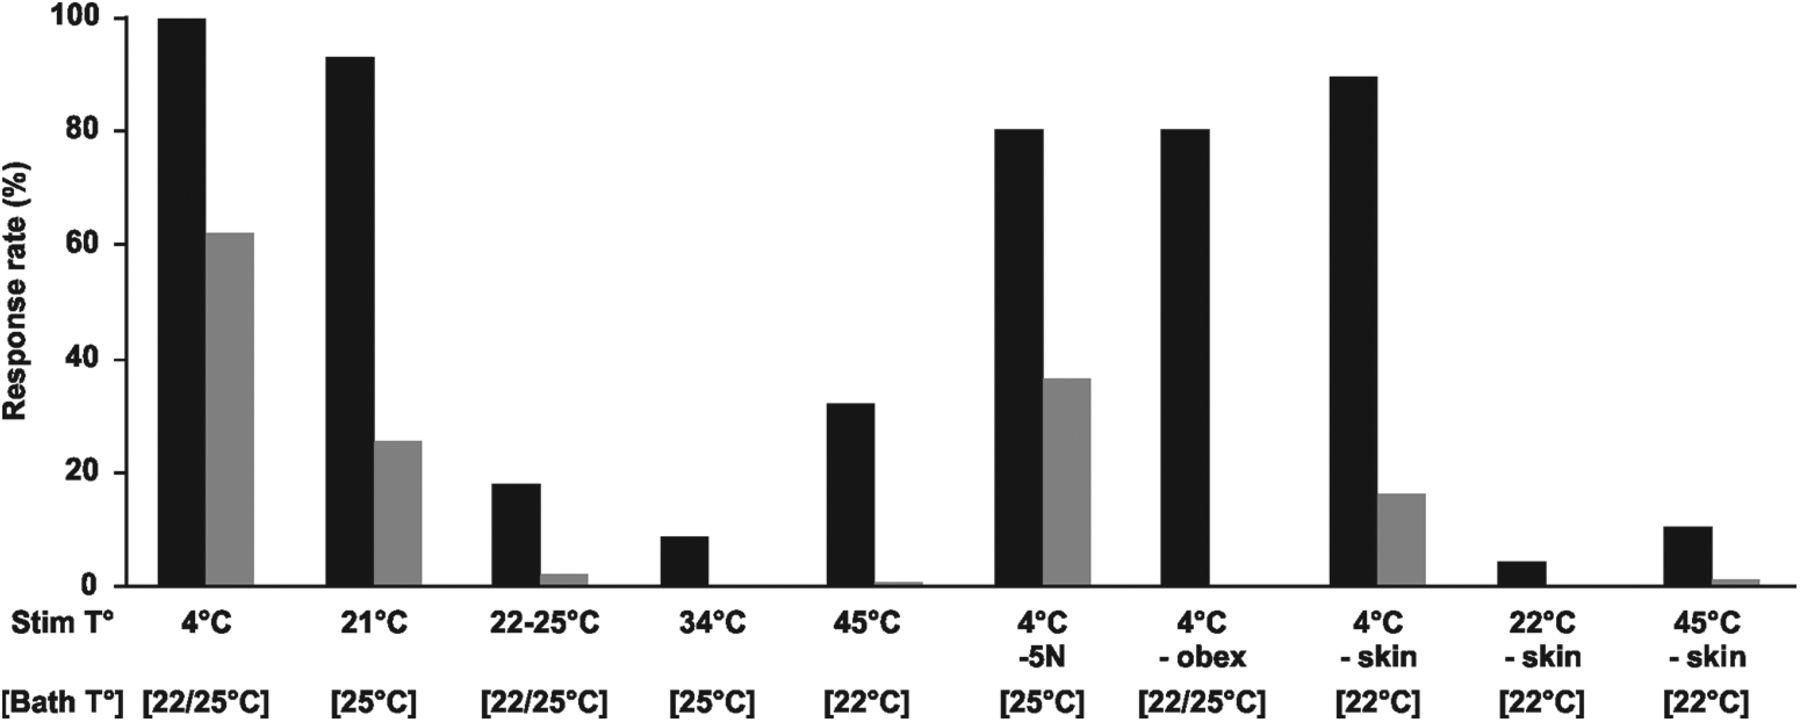 Influence of Temperature on Motor Behaviors in Newborn